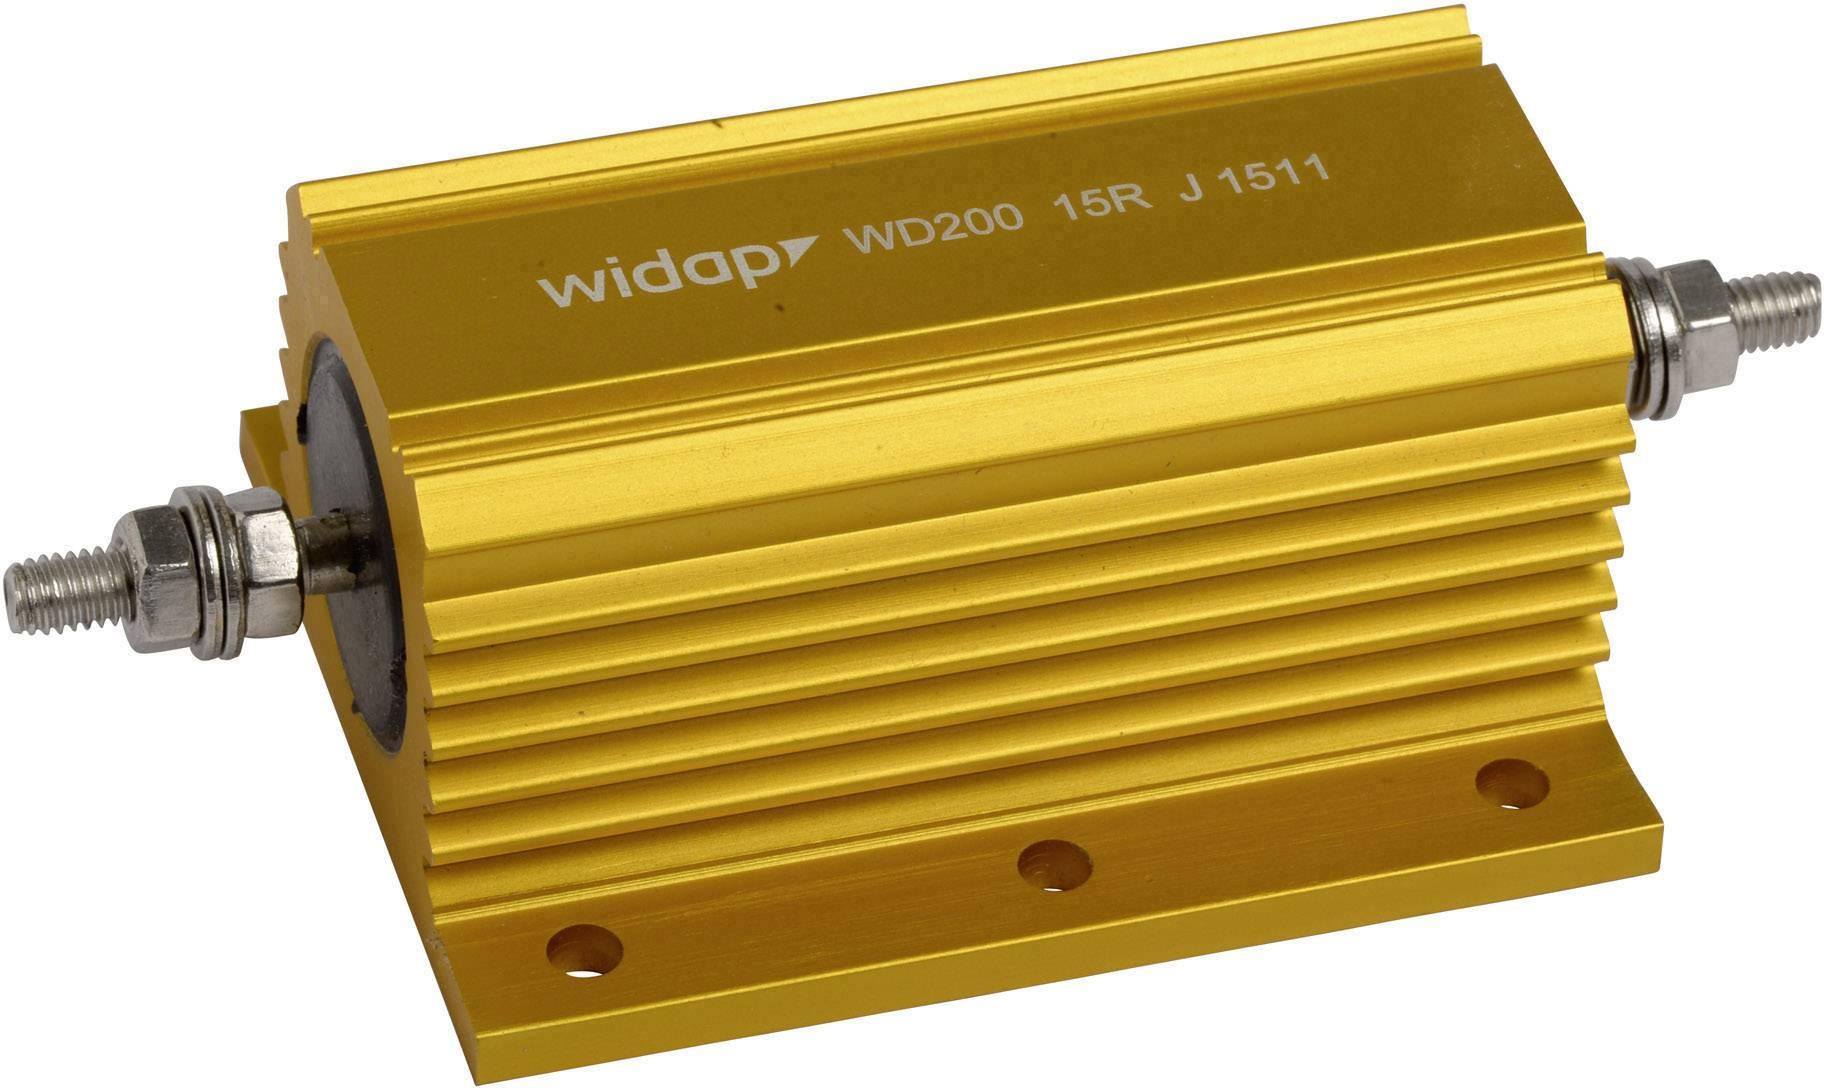 Drôtový rezistor Widap 160163, hodnota odporu 1.0 kOhm, 200 W, 1 ks